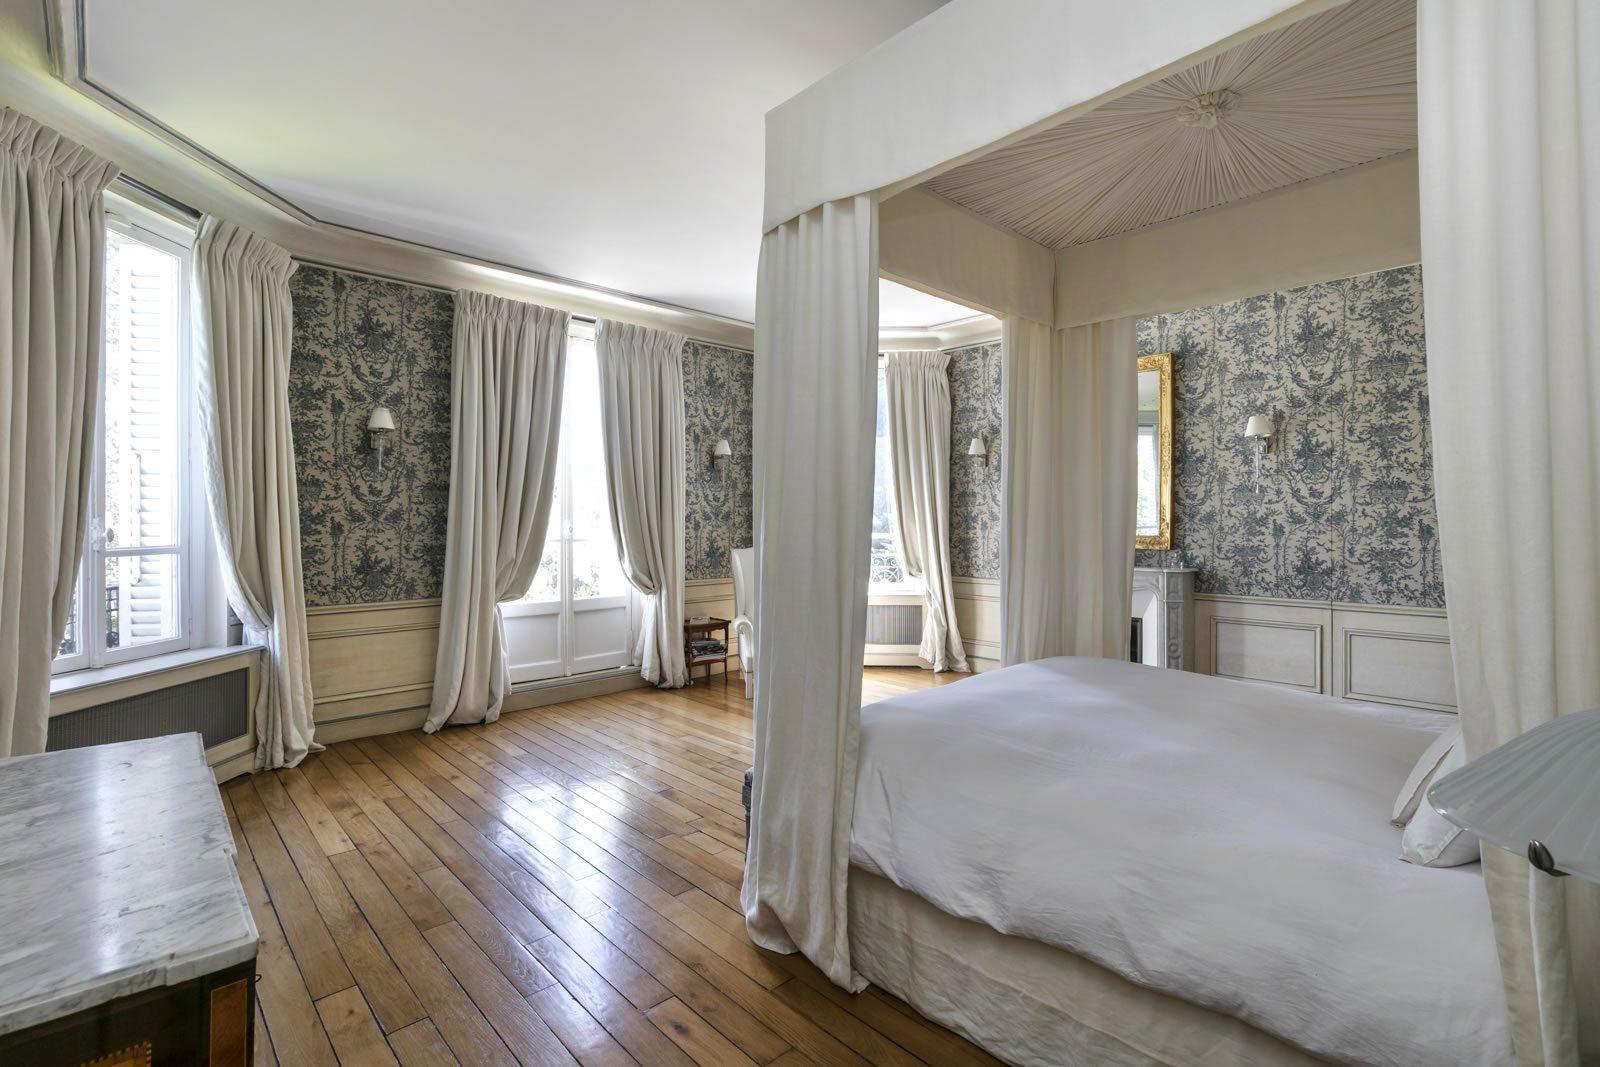 maison-renovee-style-neo-classique-a-vendre-vesinet-sud-cheminee-terrasse-jardin